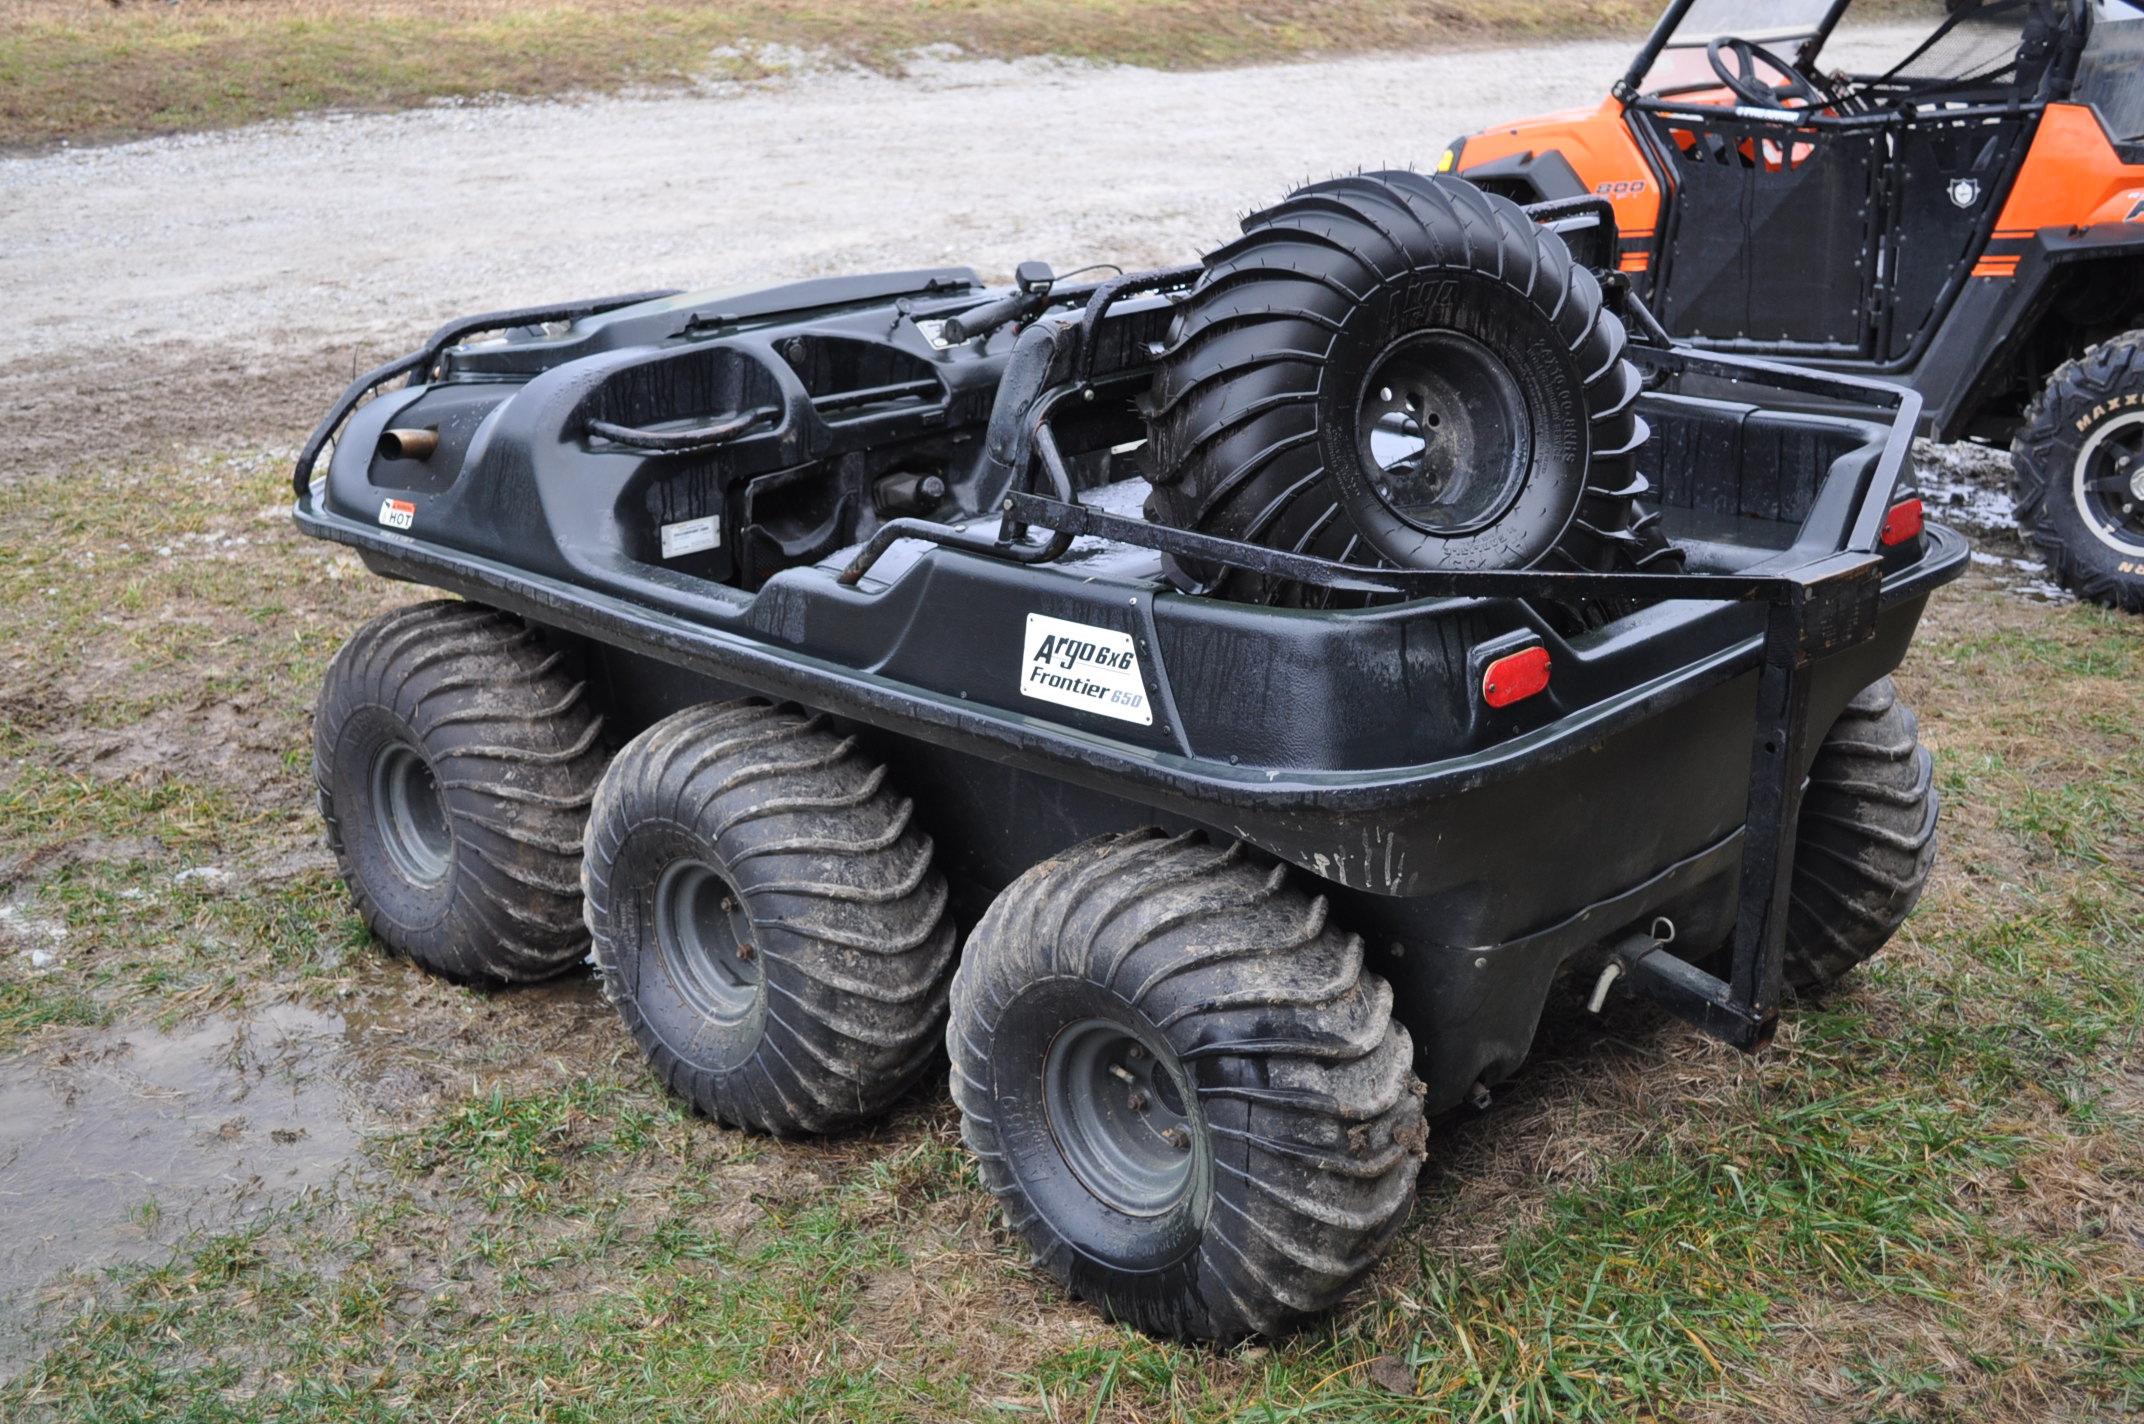 2008 Argo Frontier 650 6x6 ATV, 24 x 10.00-8 tires, 256 hrs - Image 2 of 8